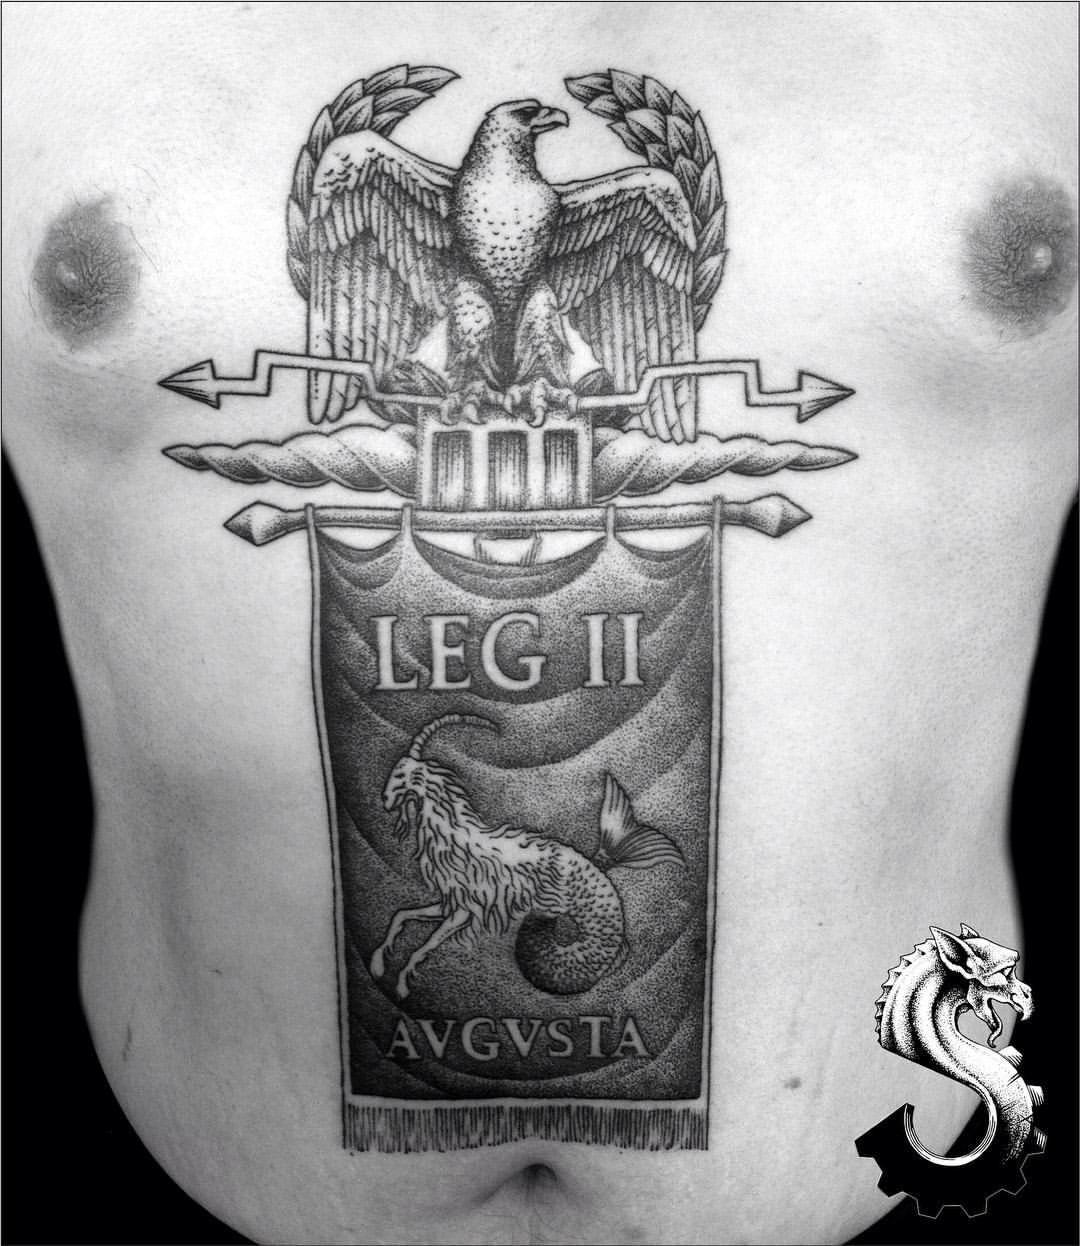 When Did The Spqr Tattoos Originate: Marcin Brzezinski (@stronghold